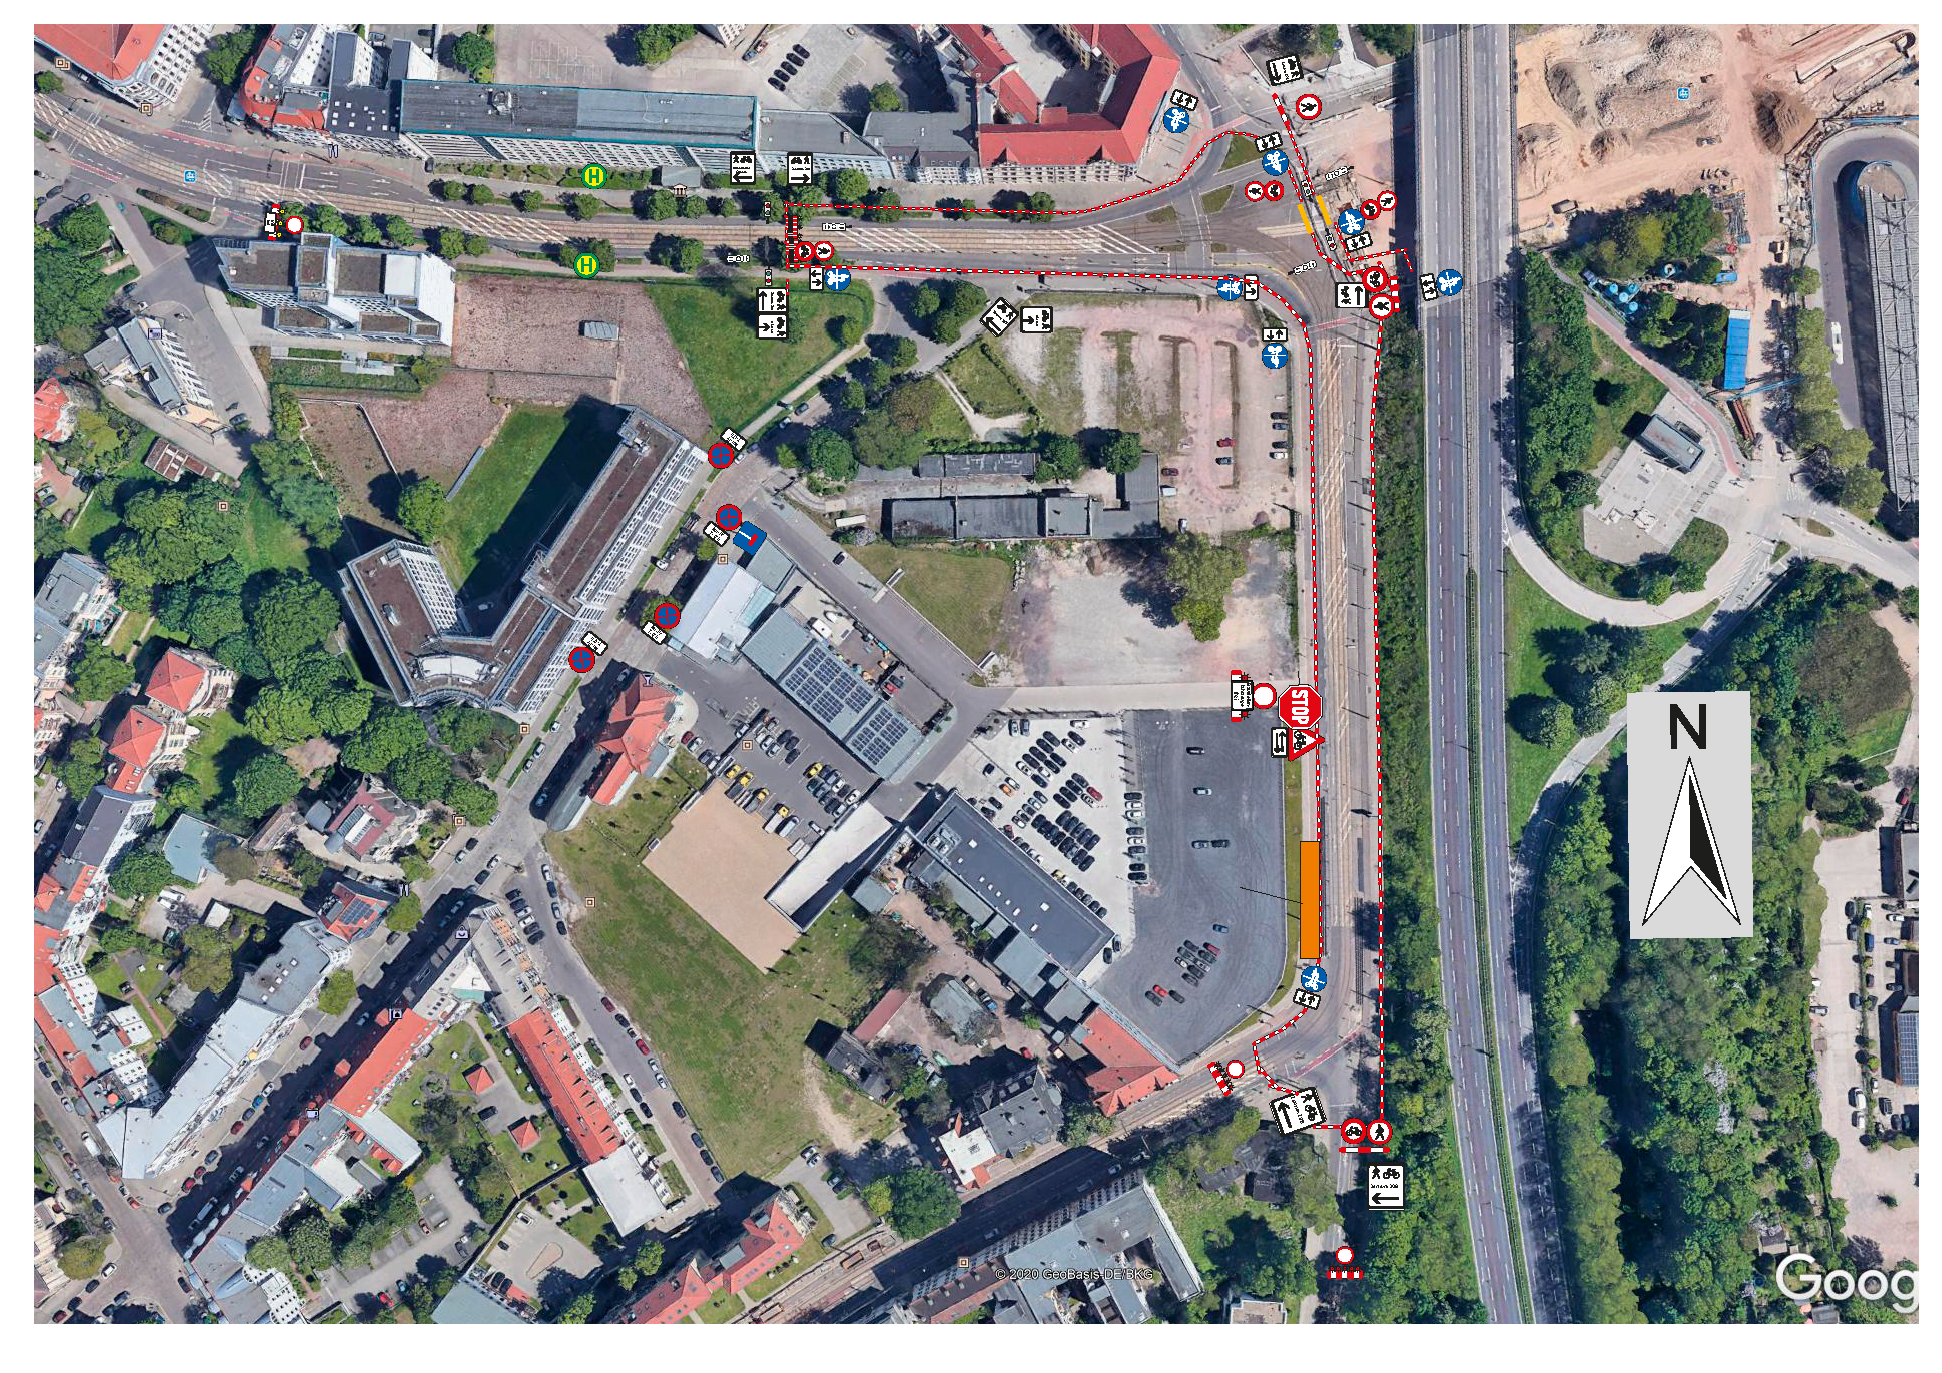 Fuß- und Radwege am Adelheidring